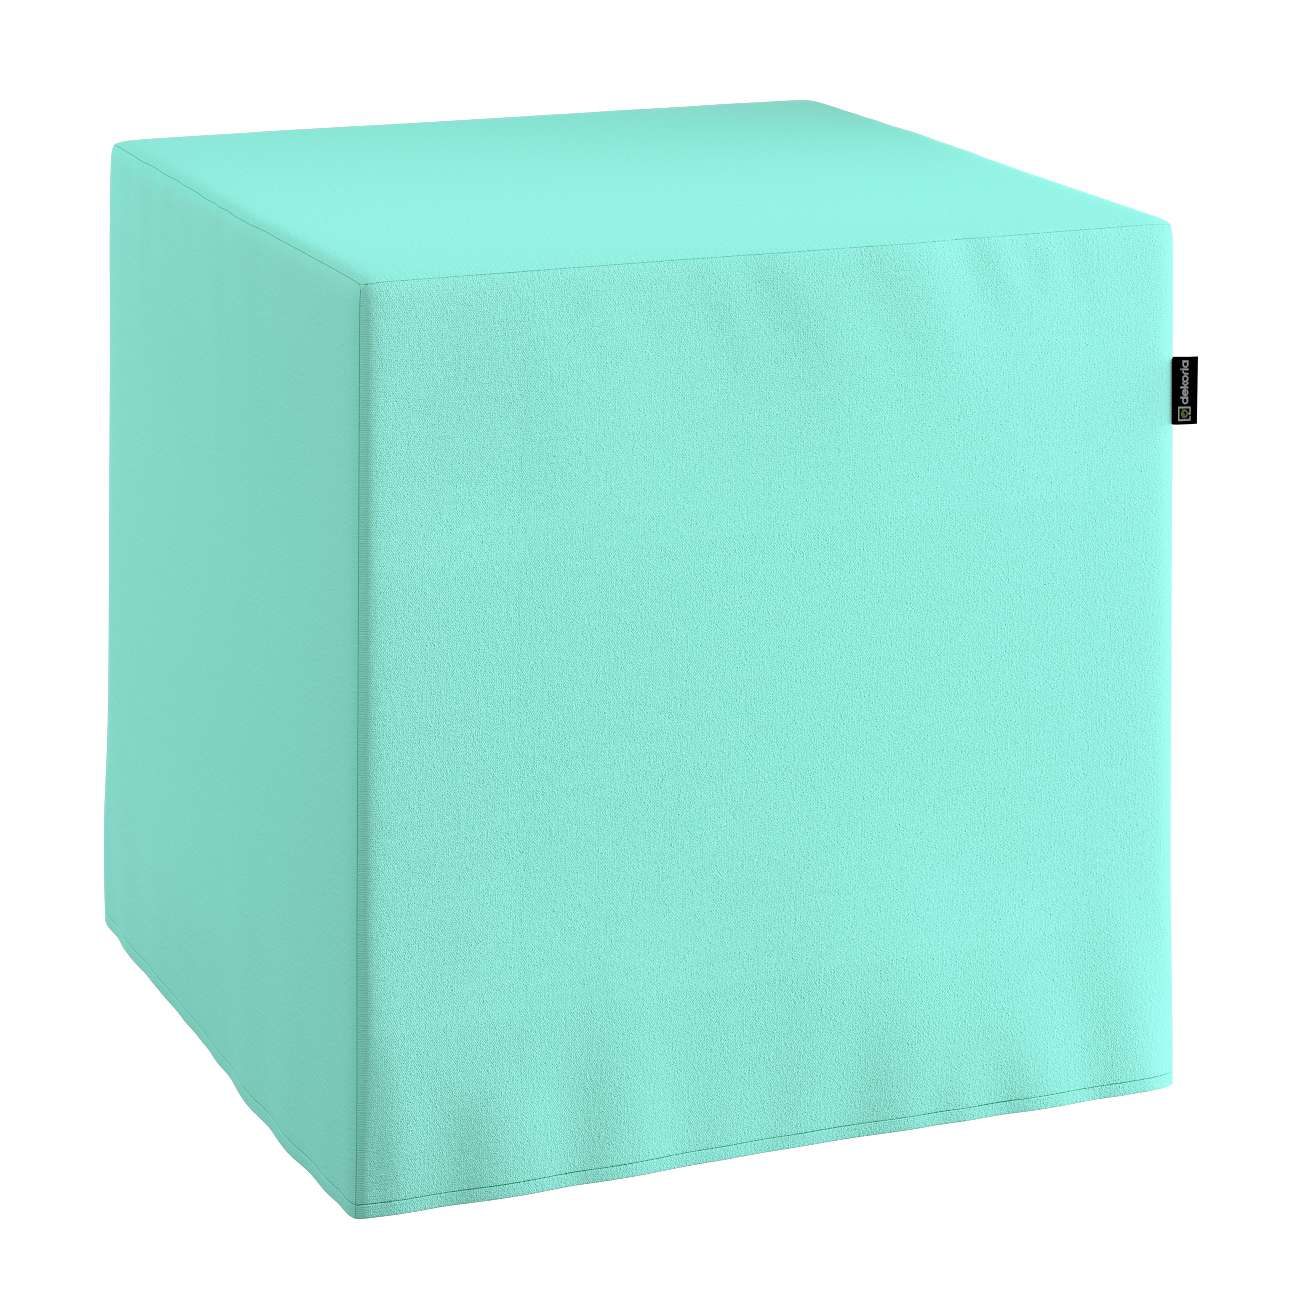 Sedák Cube - kostka pevná 40x40x40 v kolekci Loneta, látka: 133-32